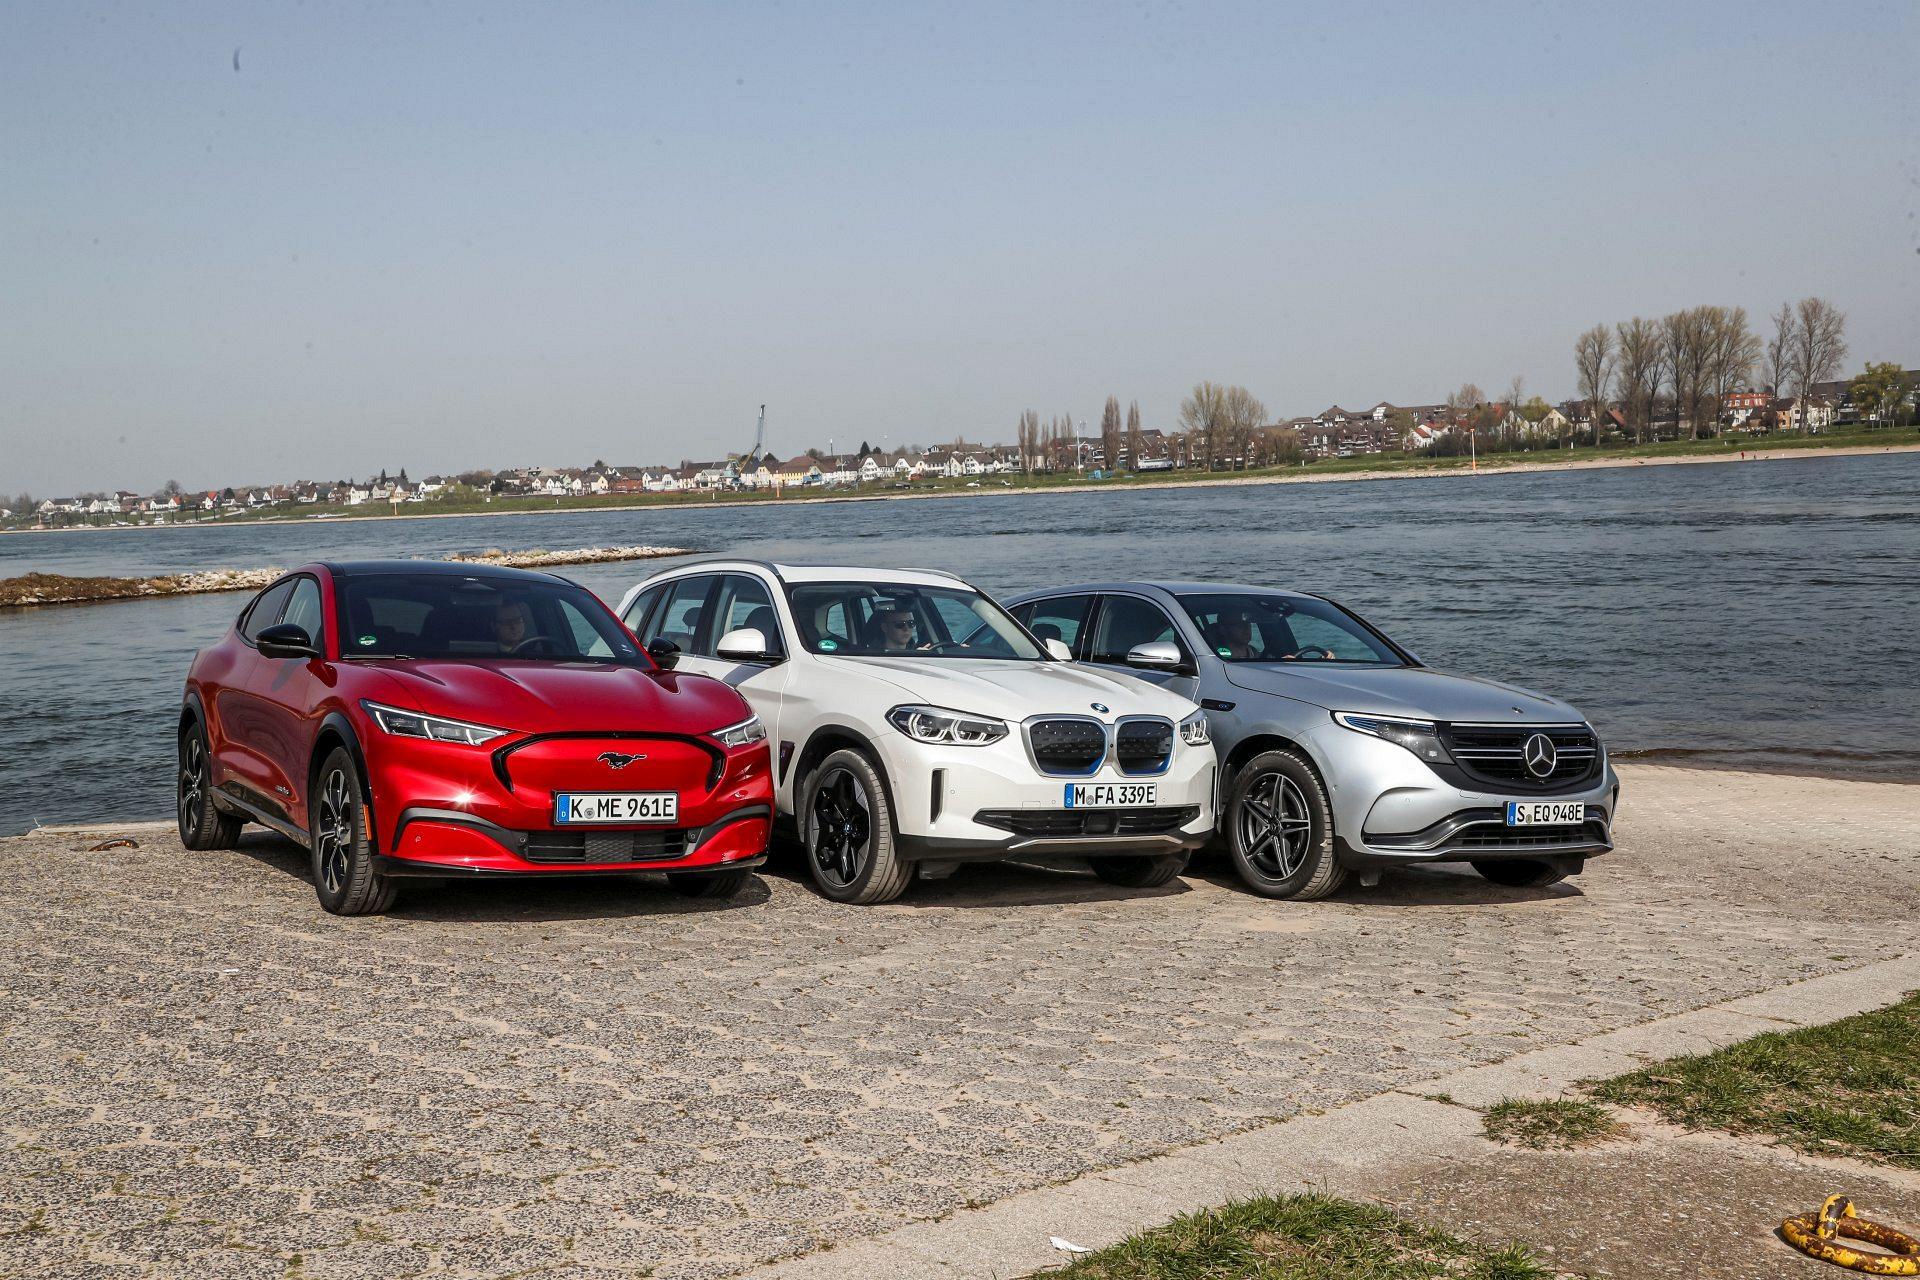 BMW_iX3_Ford_Mustang_Mach-E_Mercedes_EQC_0421_Gotta_154